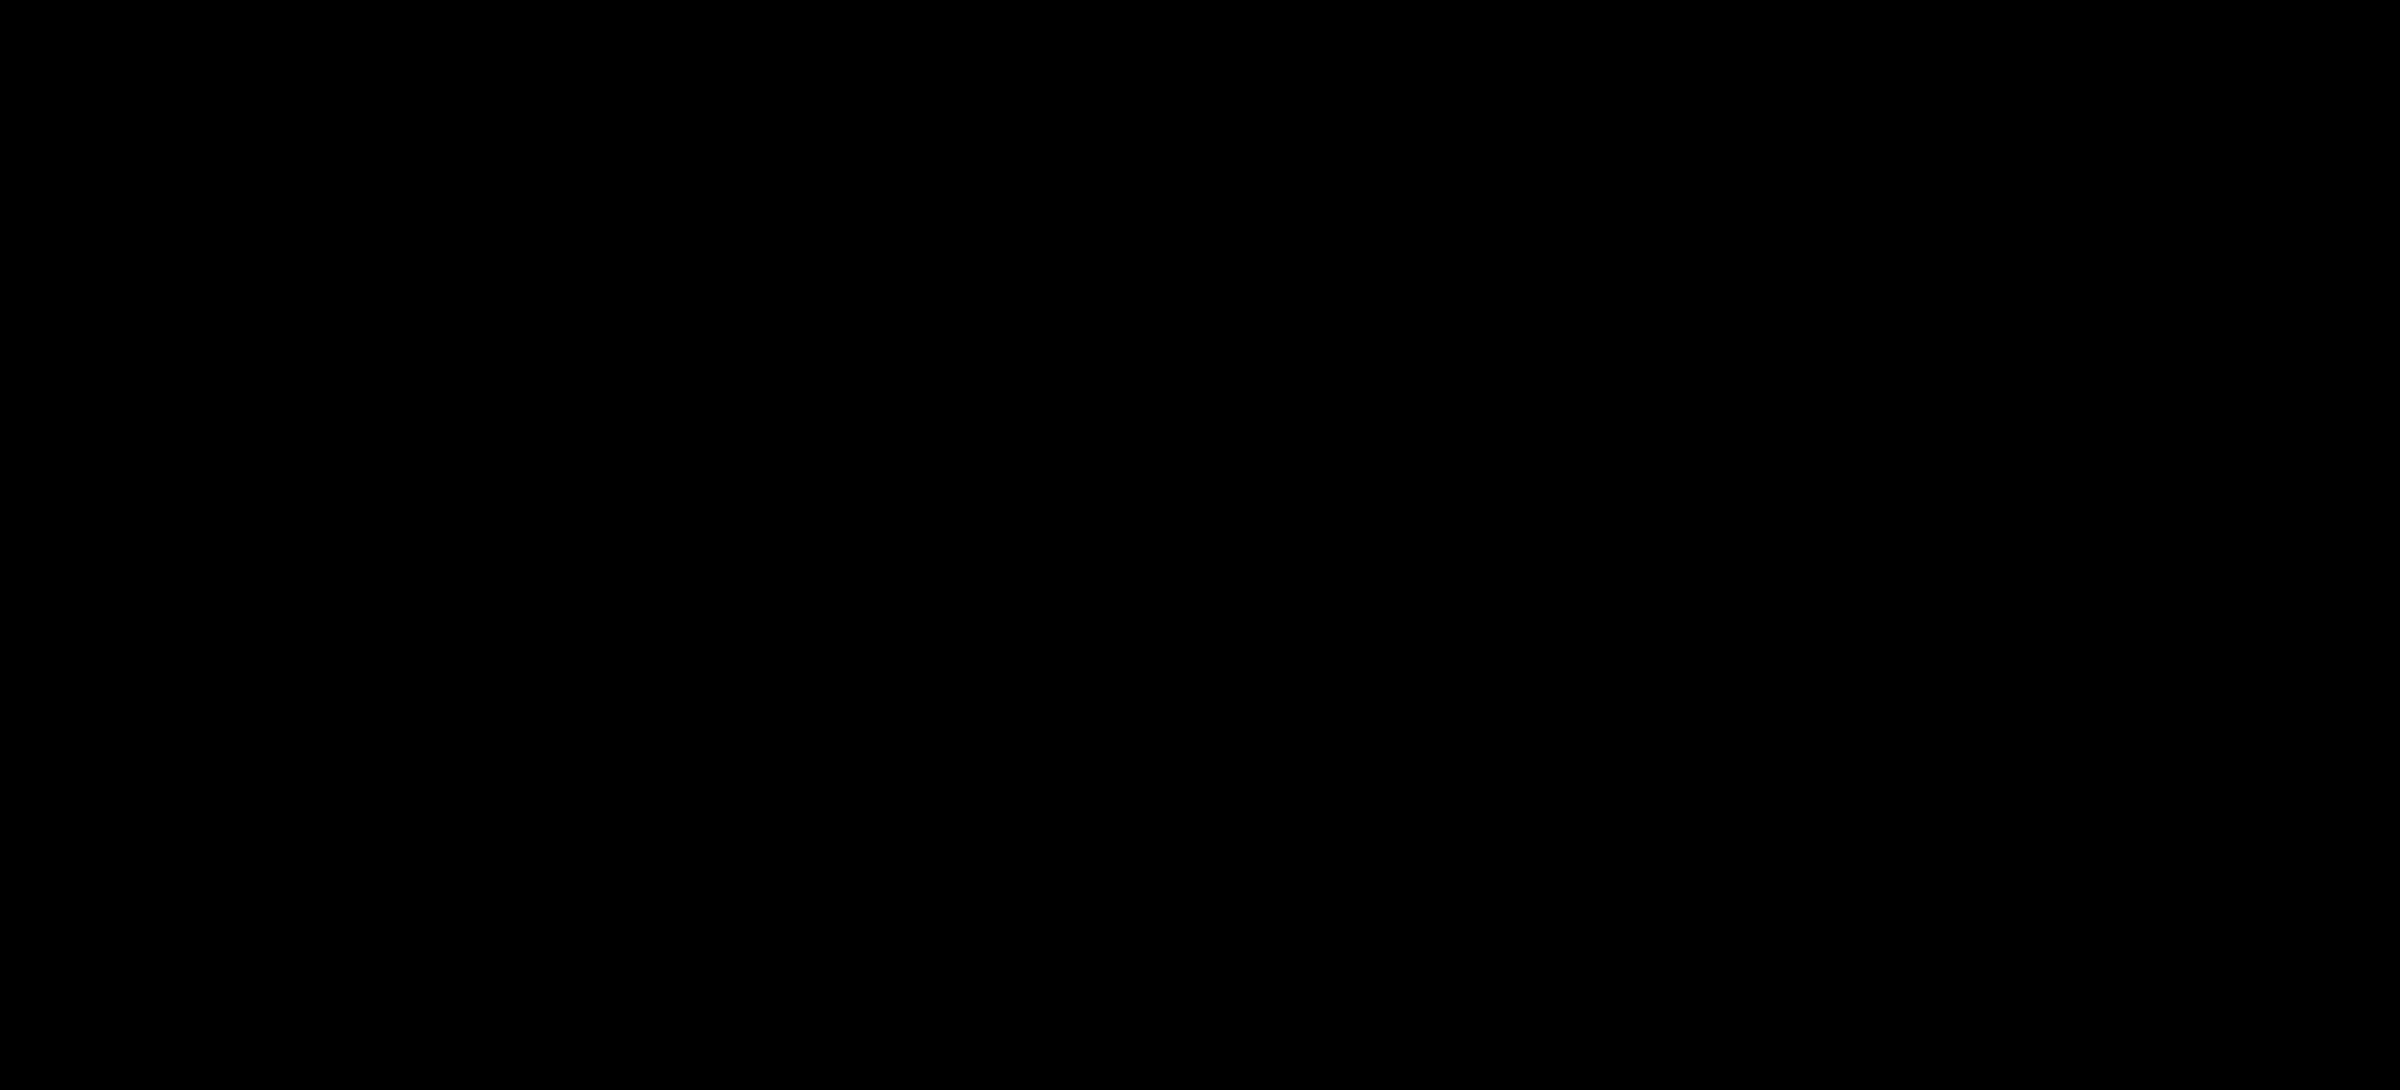 american-standard-2-logo-png-transparent.png